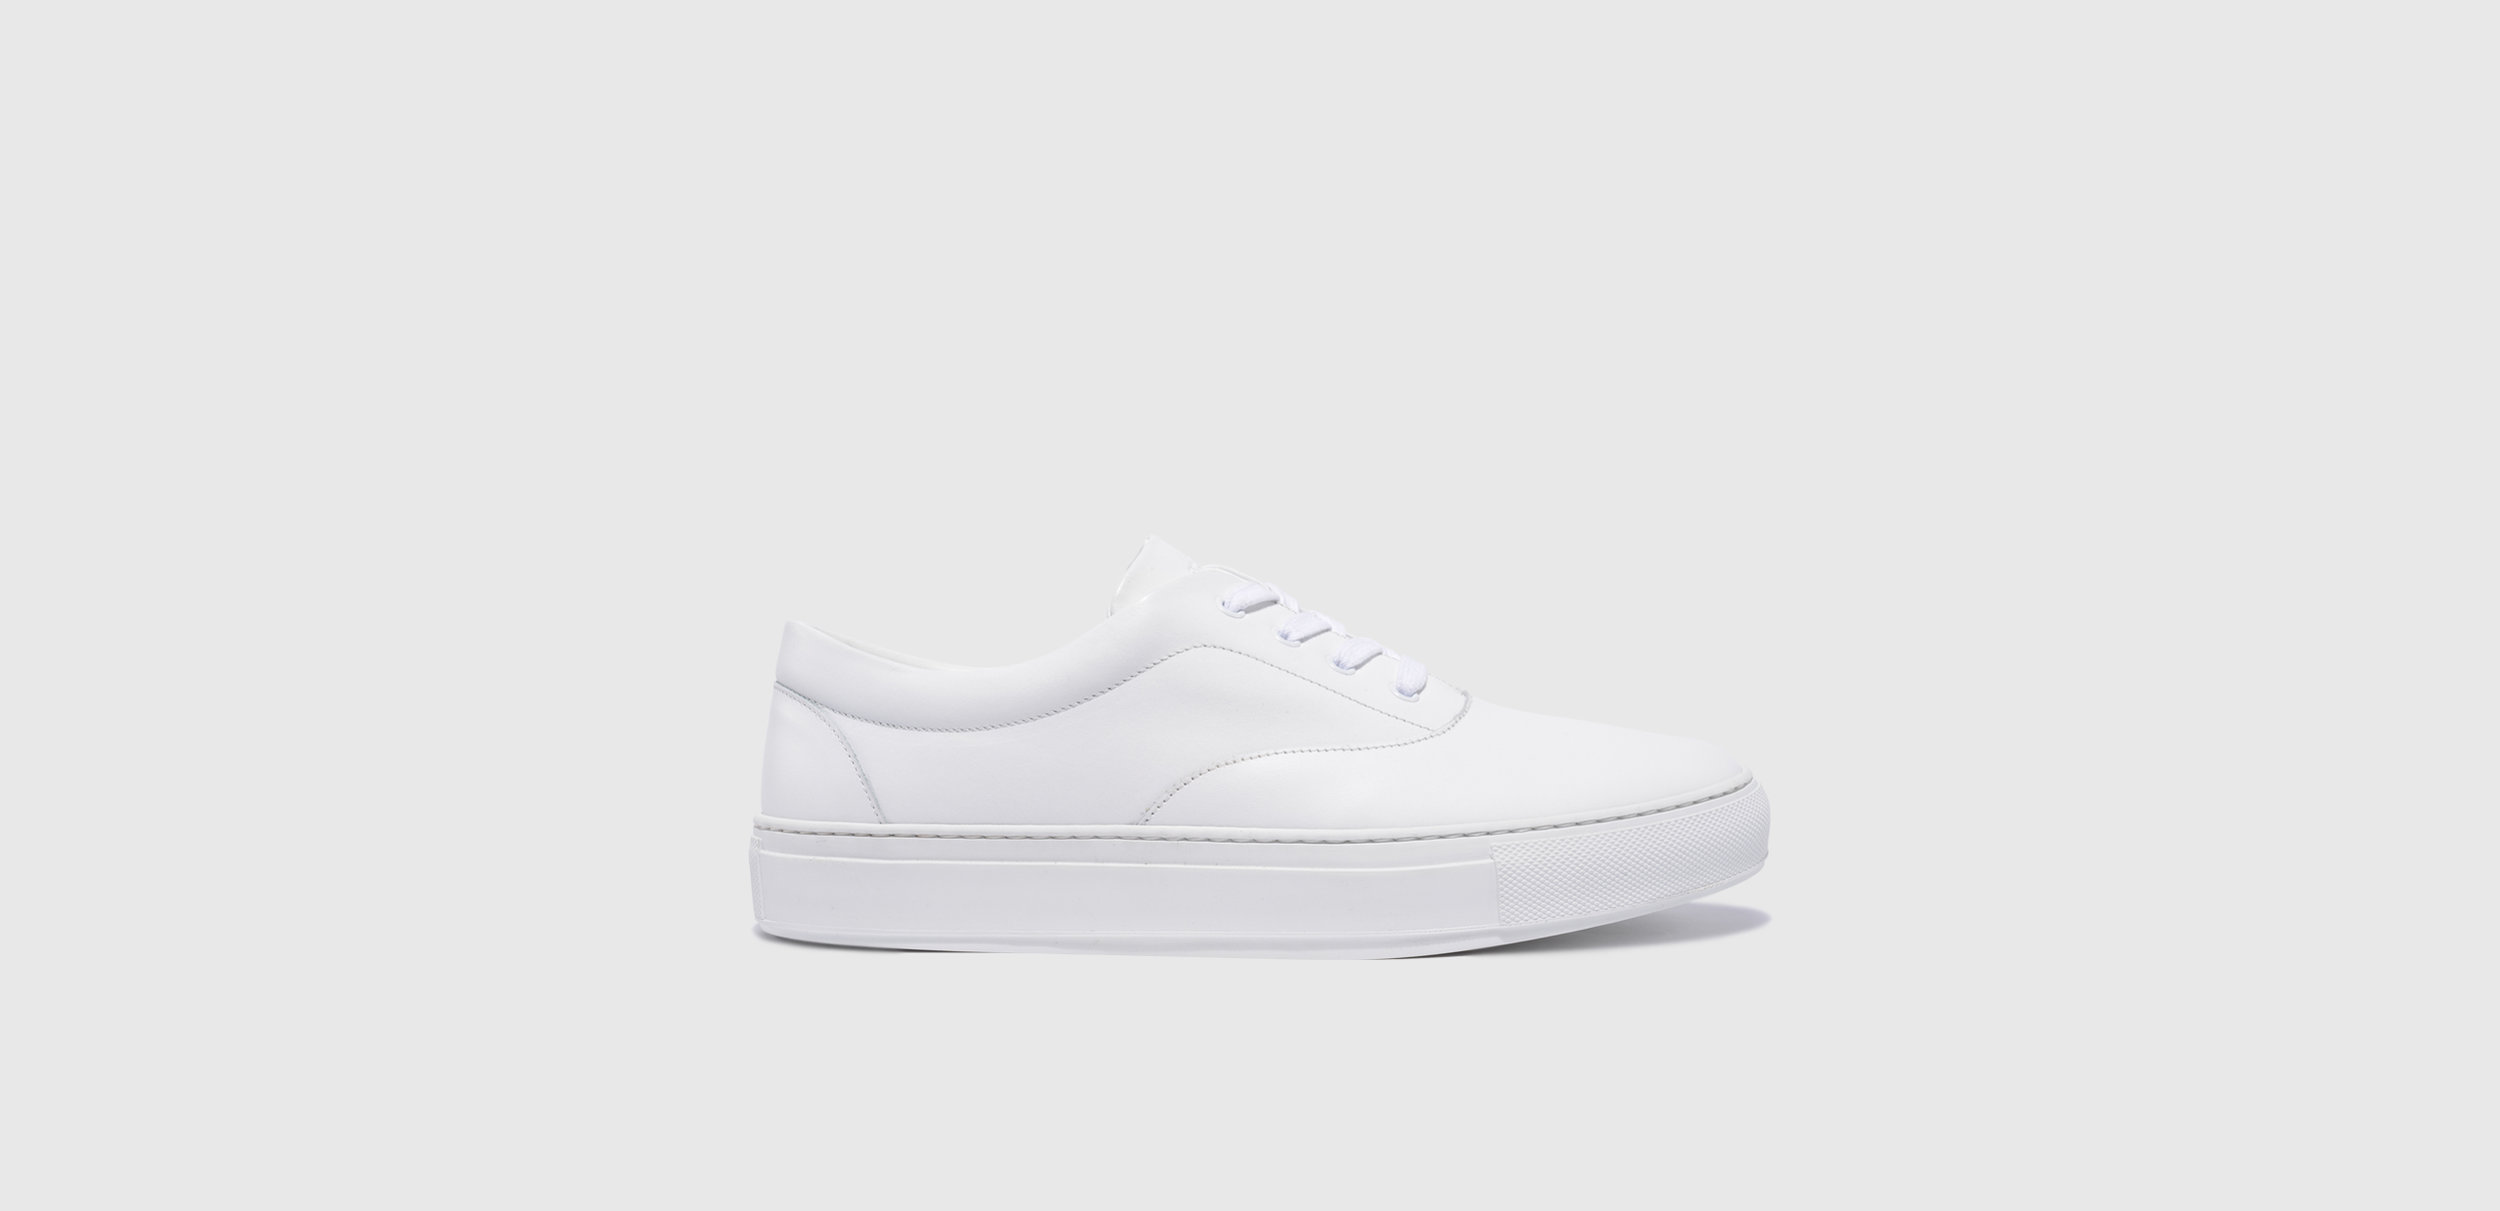 balmoral-01-leather-white-m.jpg